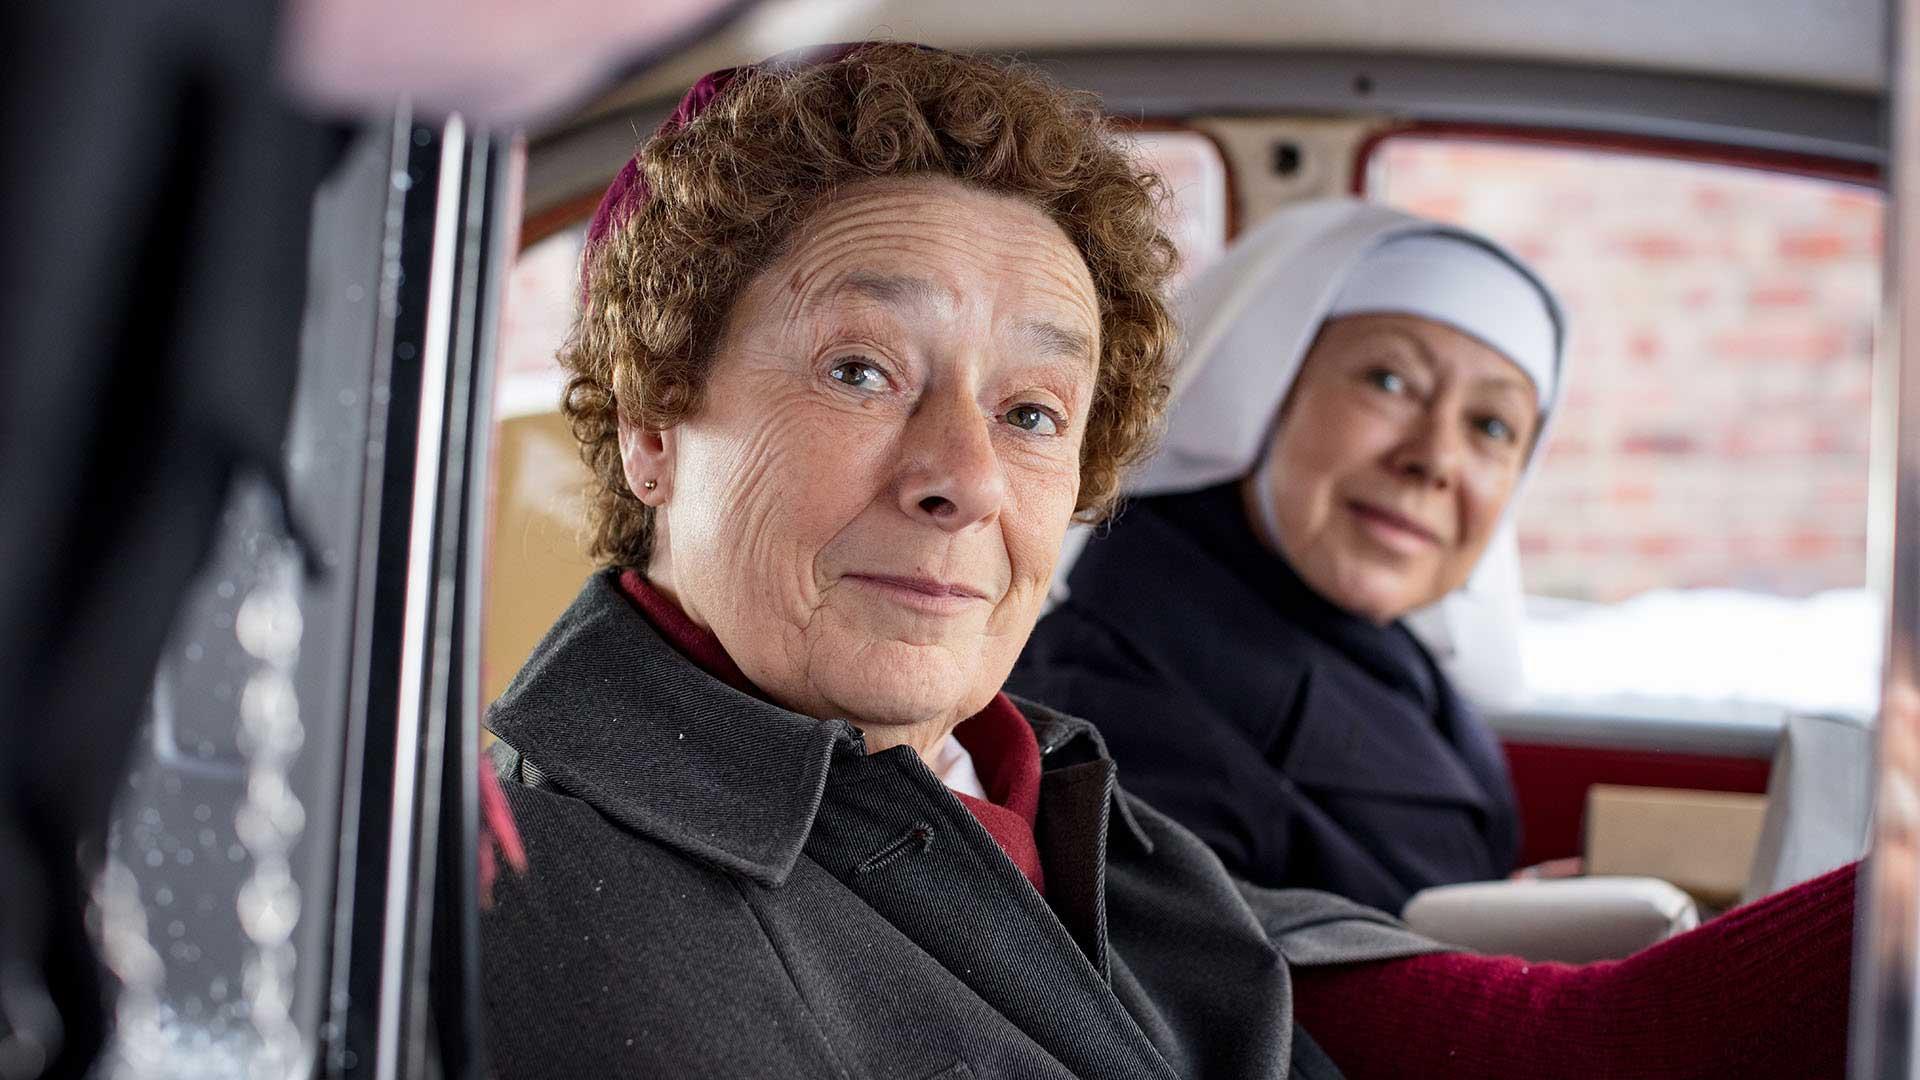 Linda Bassett as Phyllis Crane